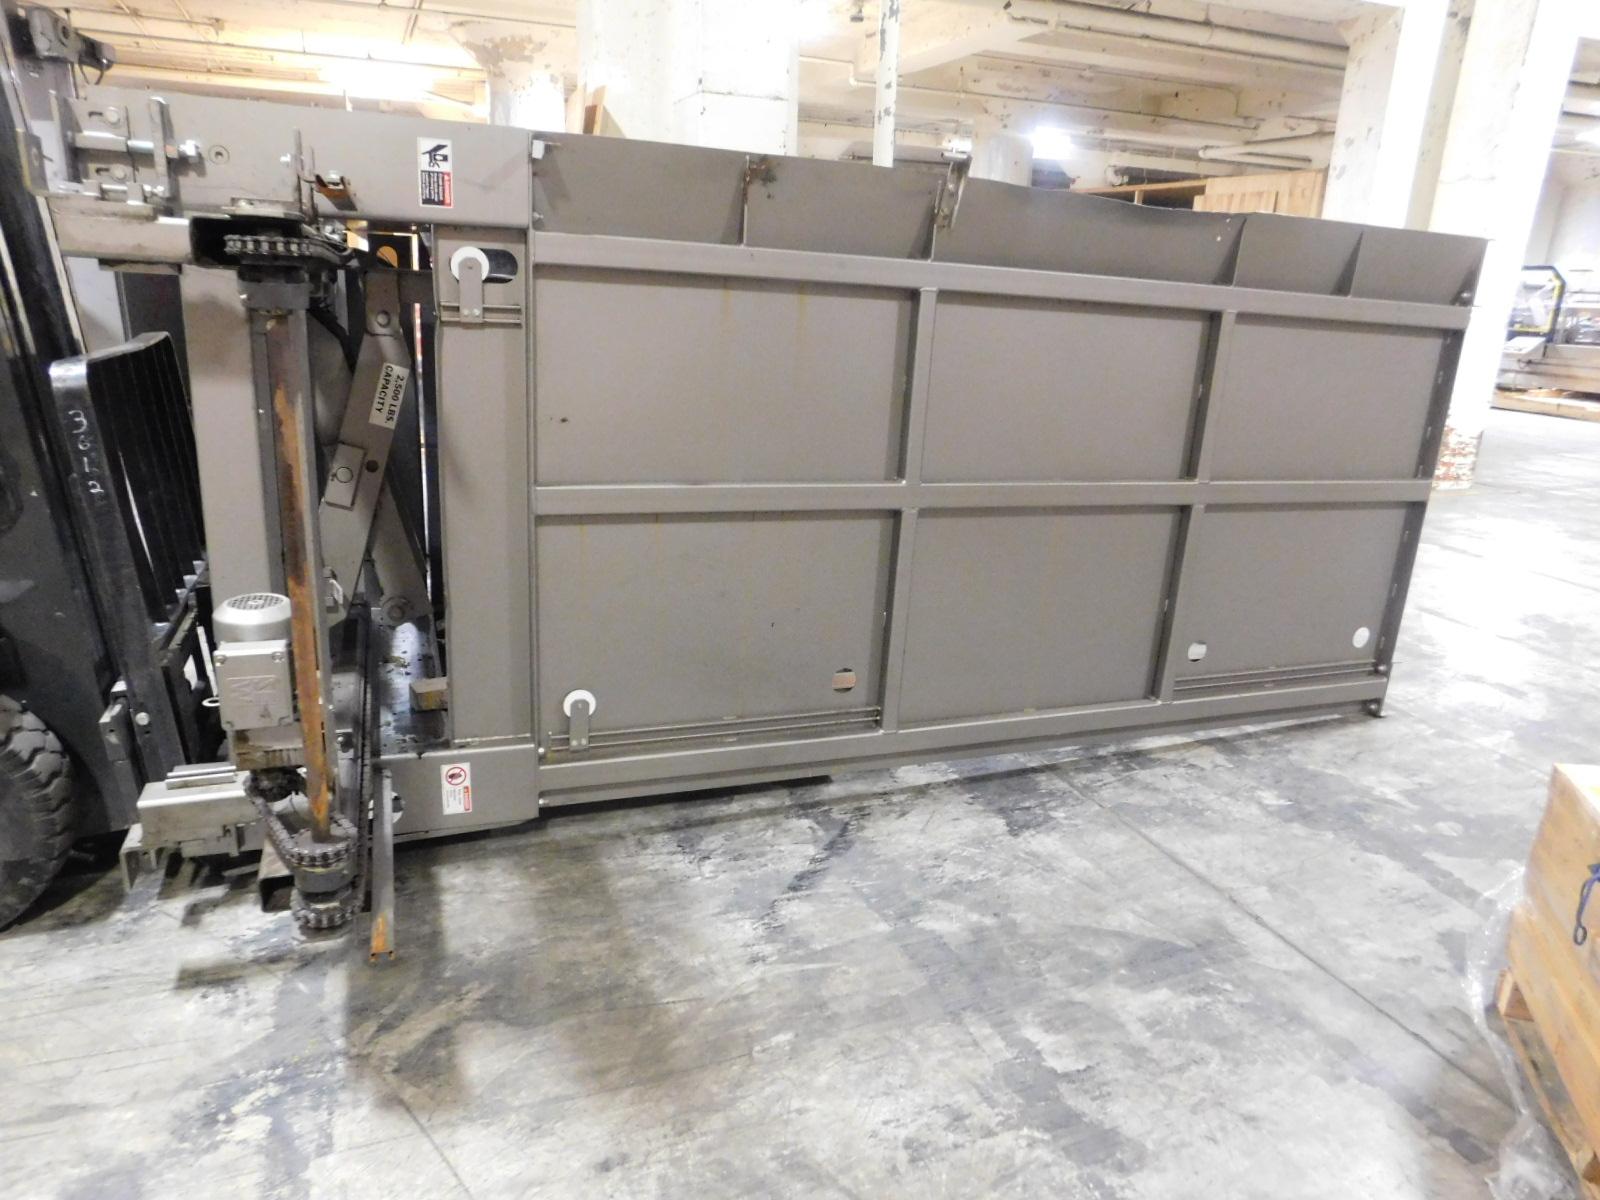 Lot 25 - Bastian Material Handling Low Level Case Palletizer Model 4000, SN:9182-100, Mfg. 2007,Low Level